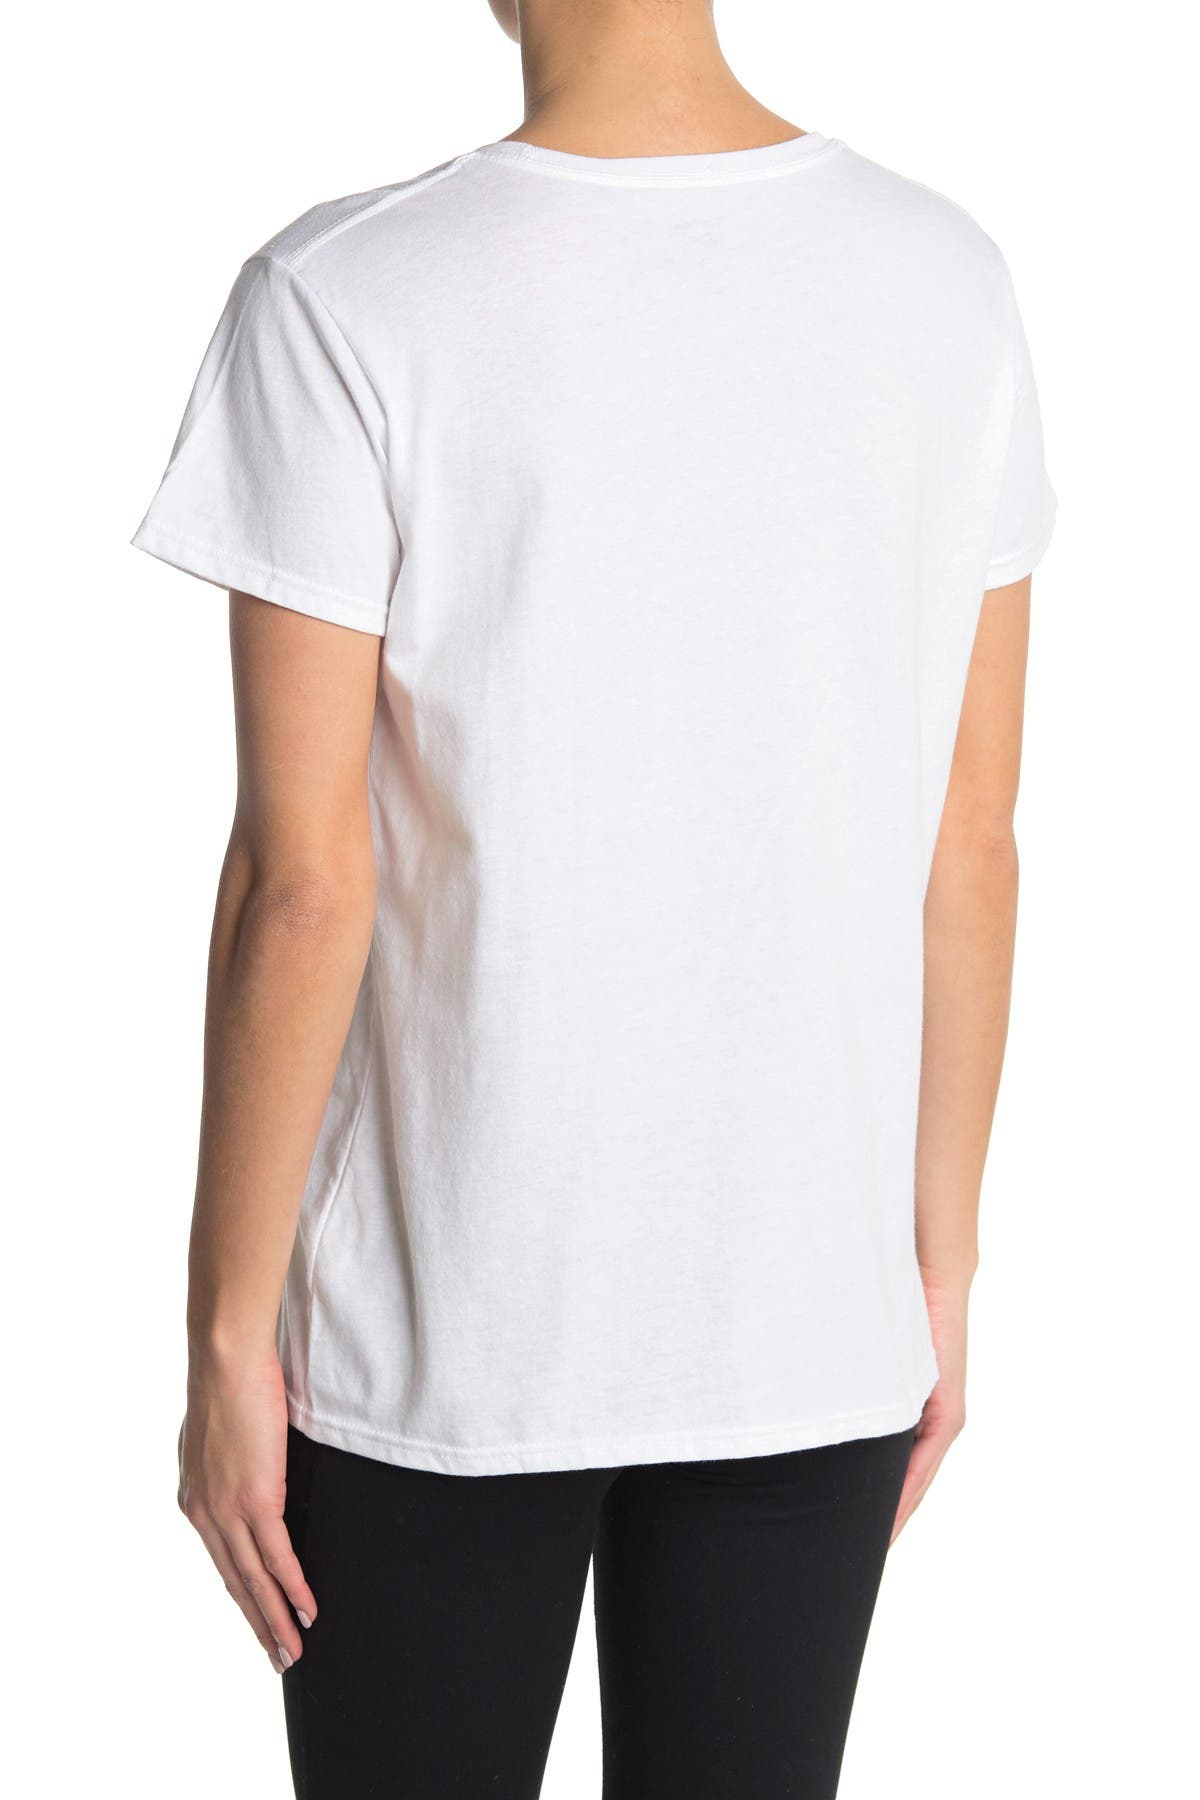 Image of Reebok Vector Logo Graphic T-Shirt